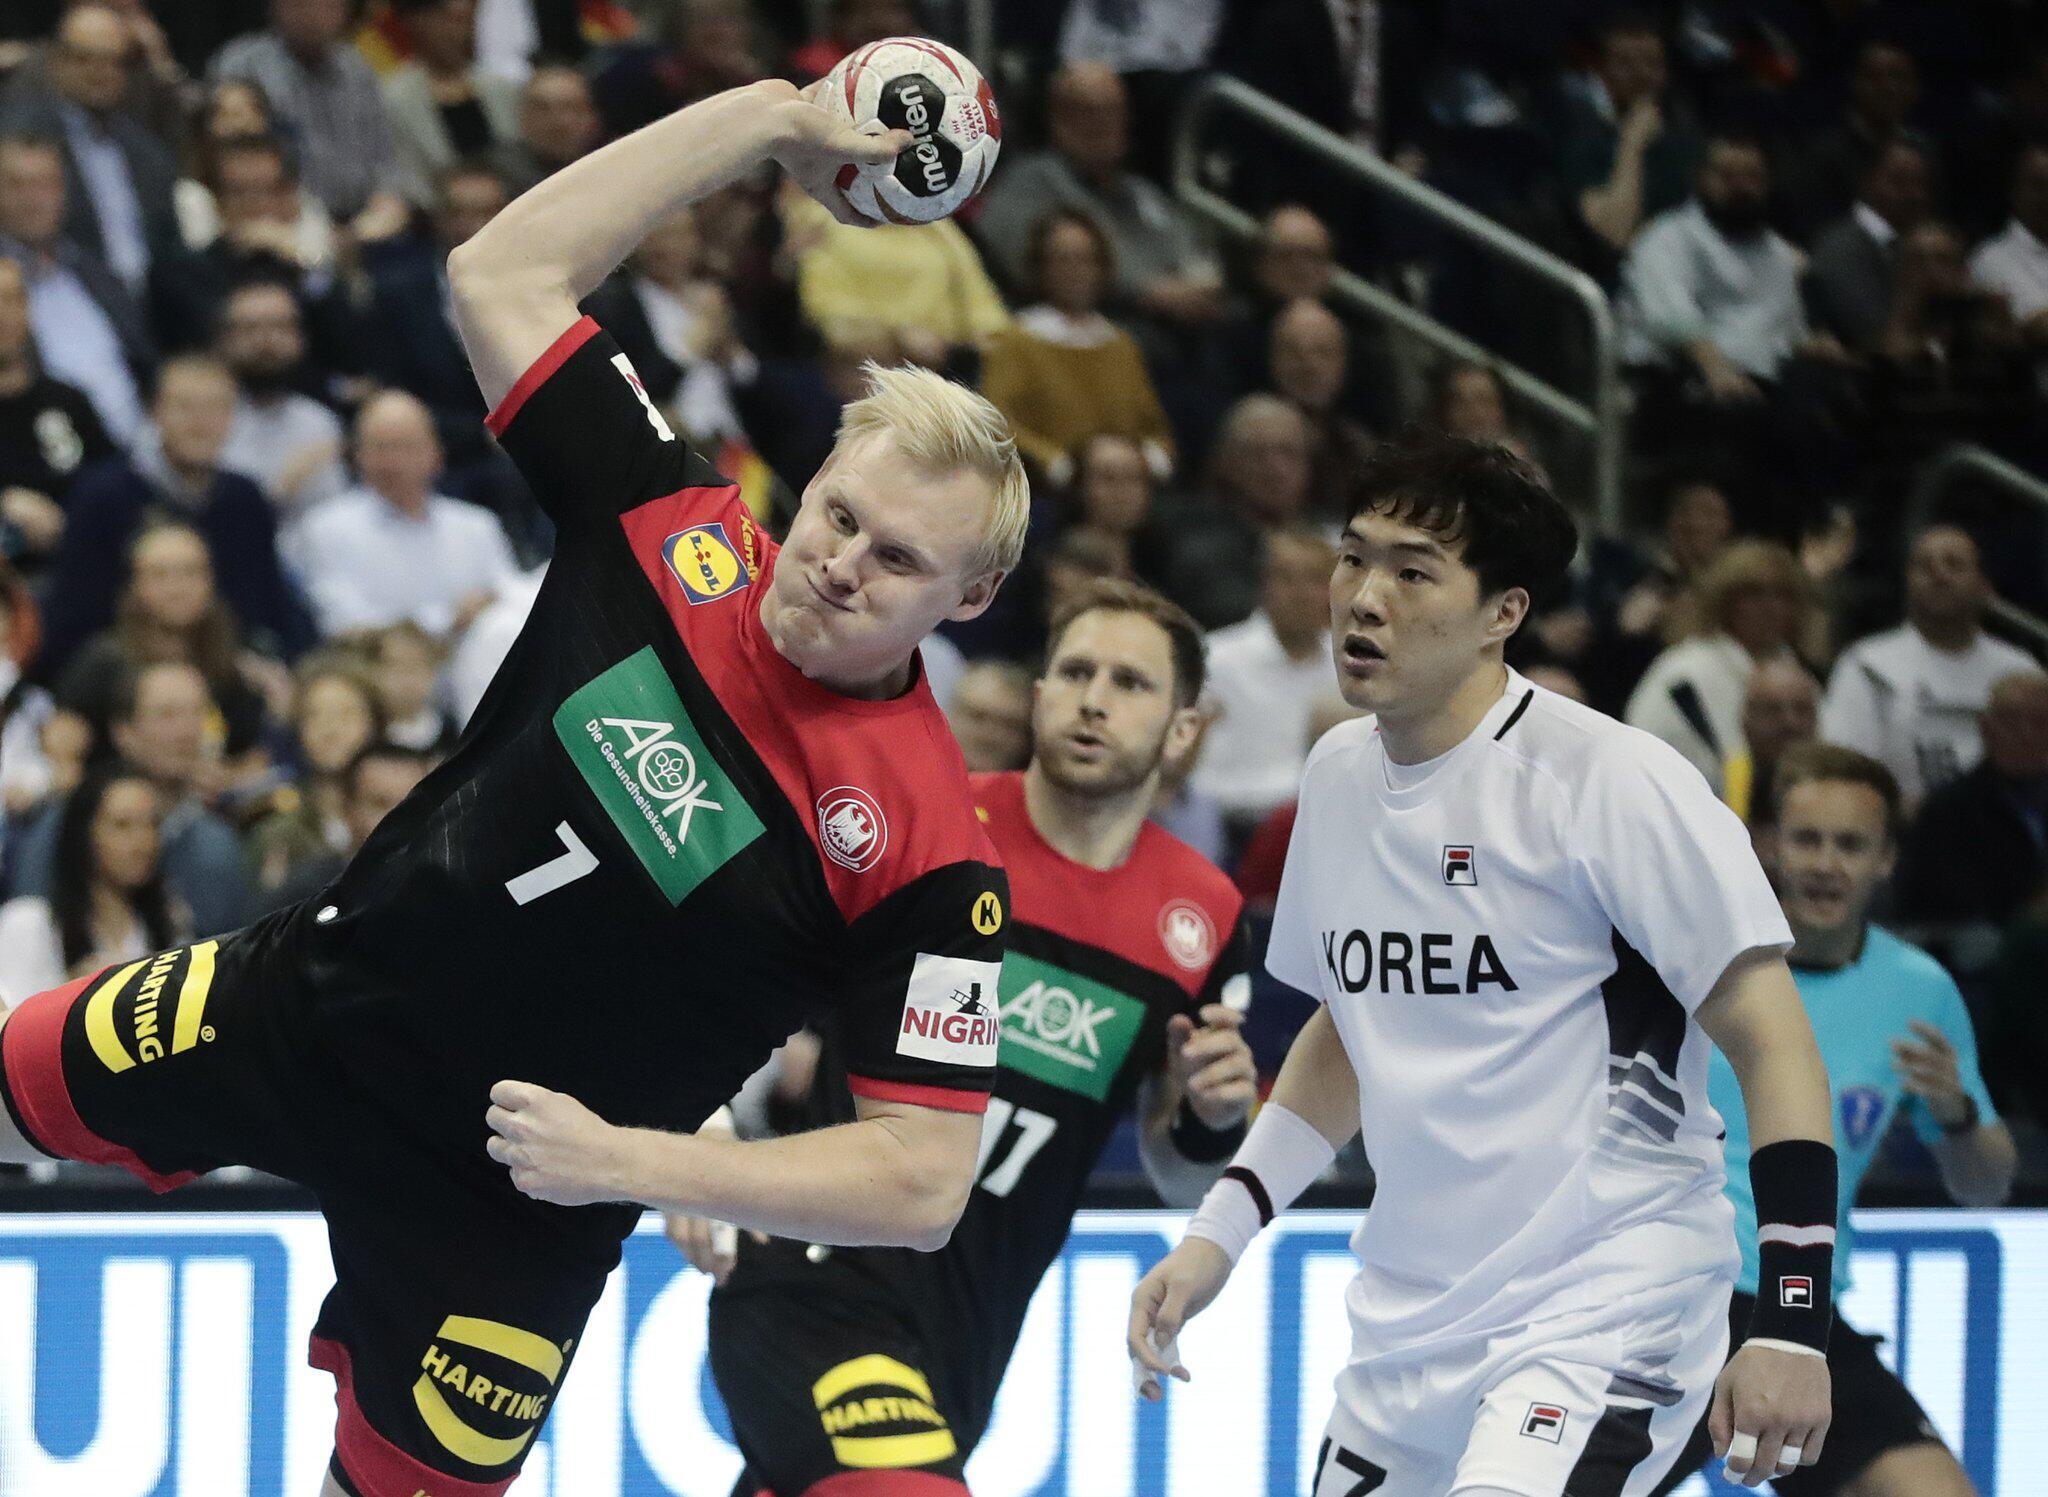 Handball Wm 2019 Korea Deutschland Gmx